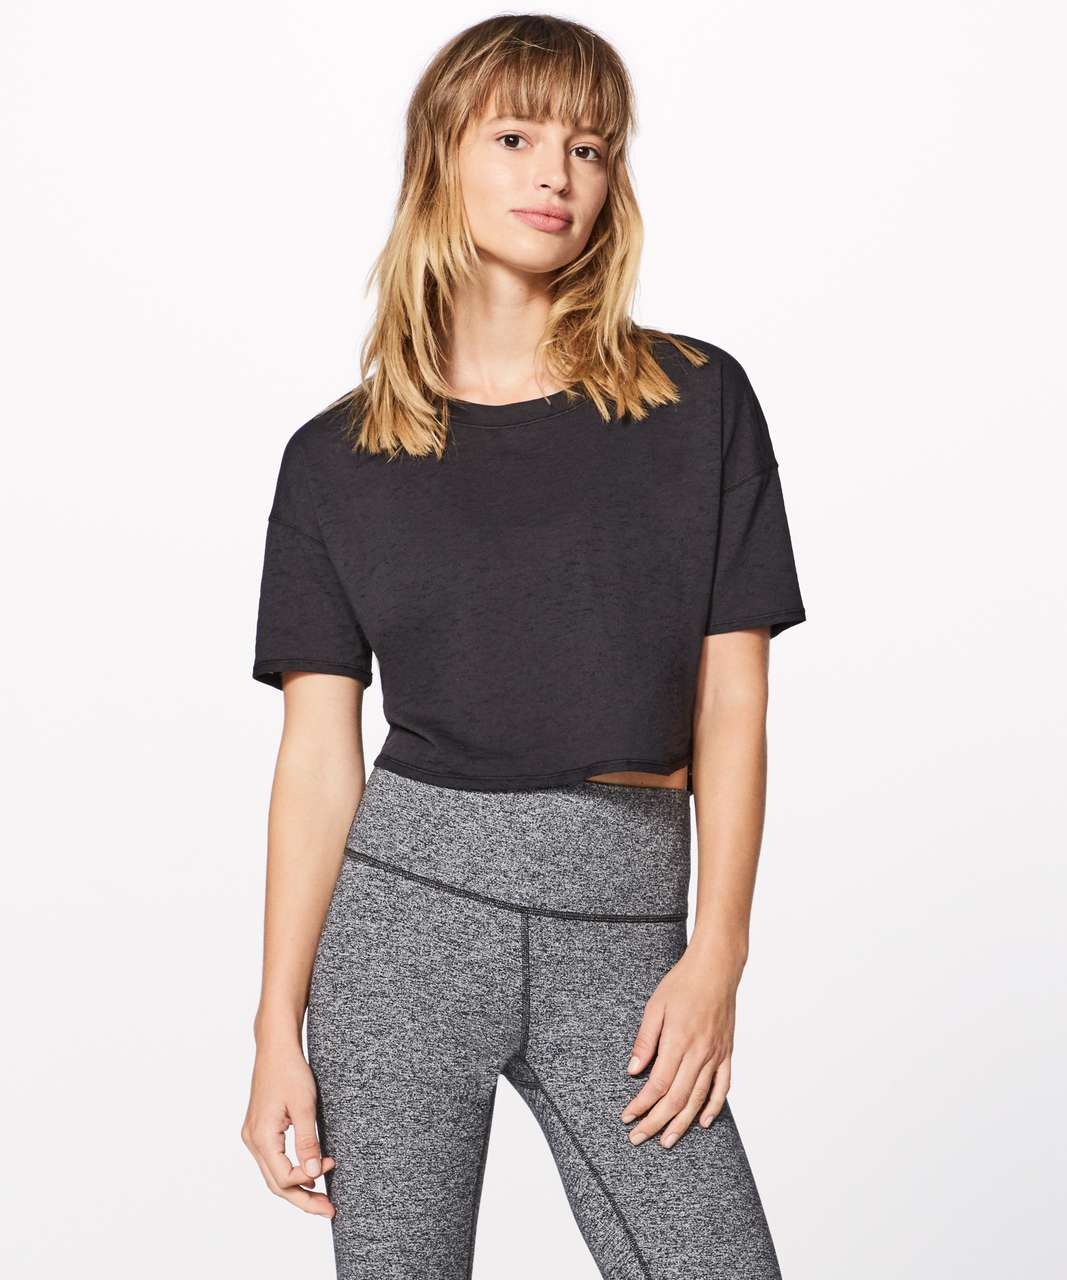 461402cf57 Lululemon shirt Black womens lululemon shirt Slightly cropped A